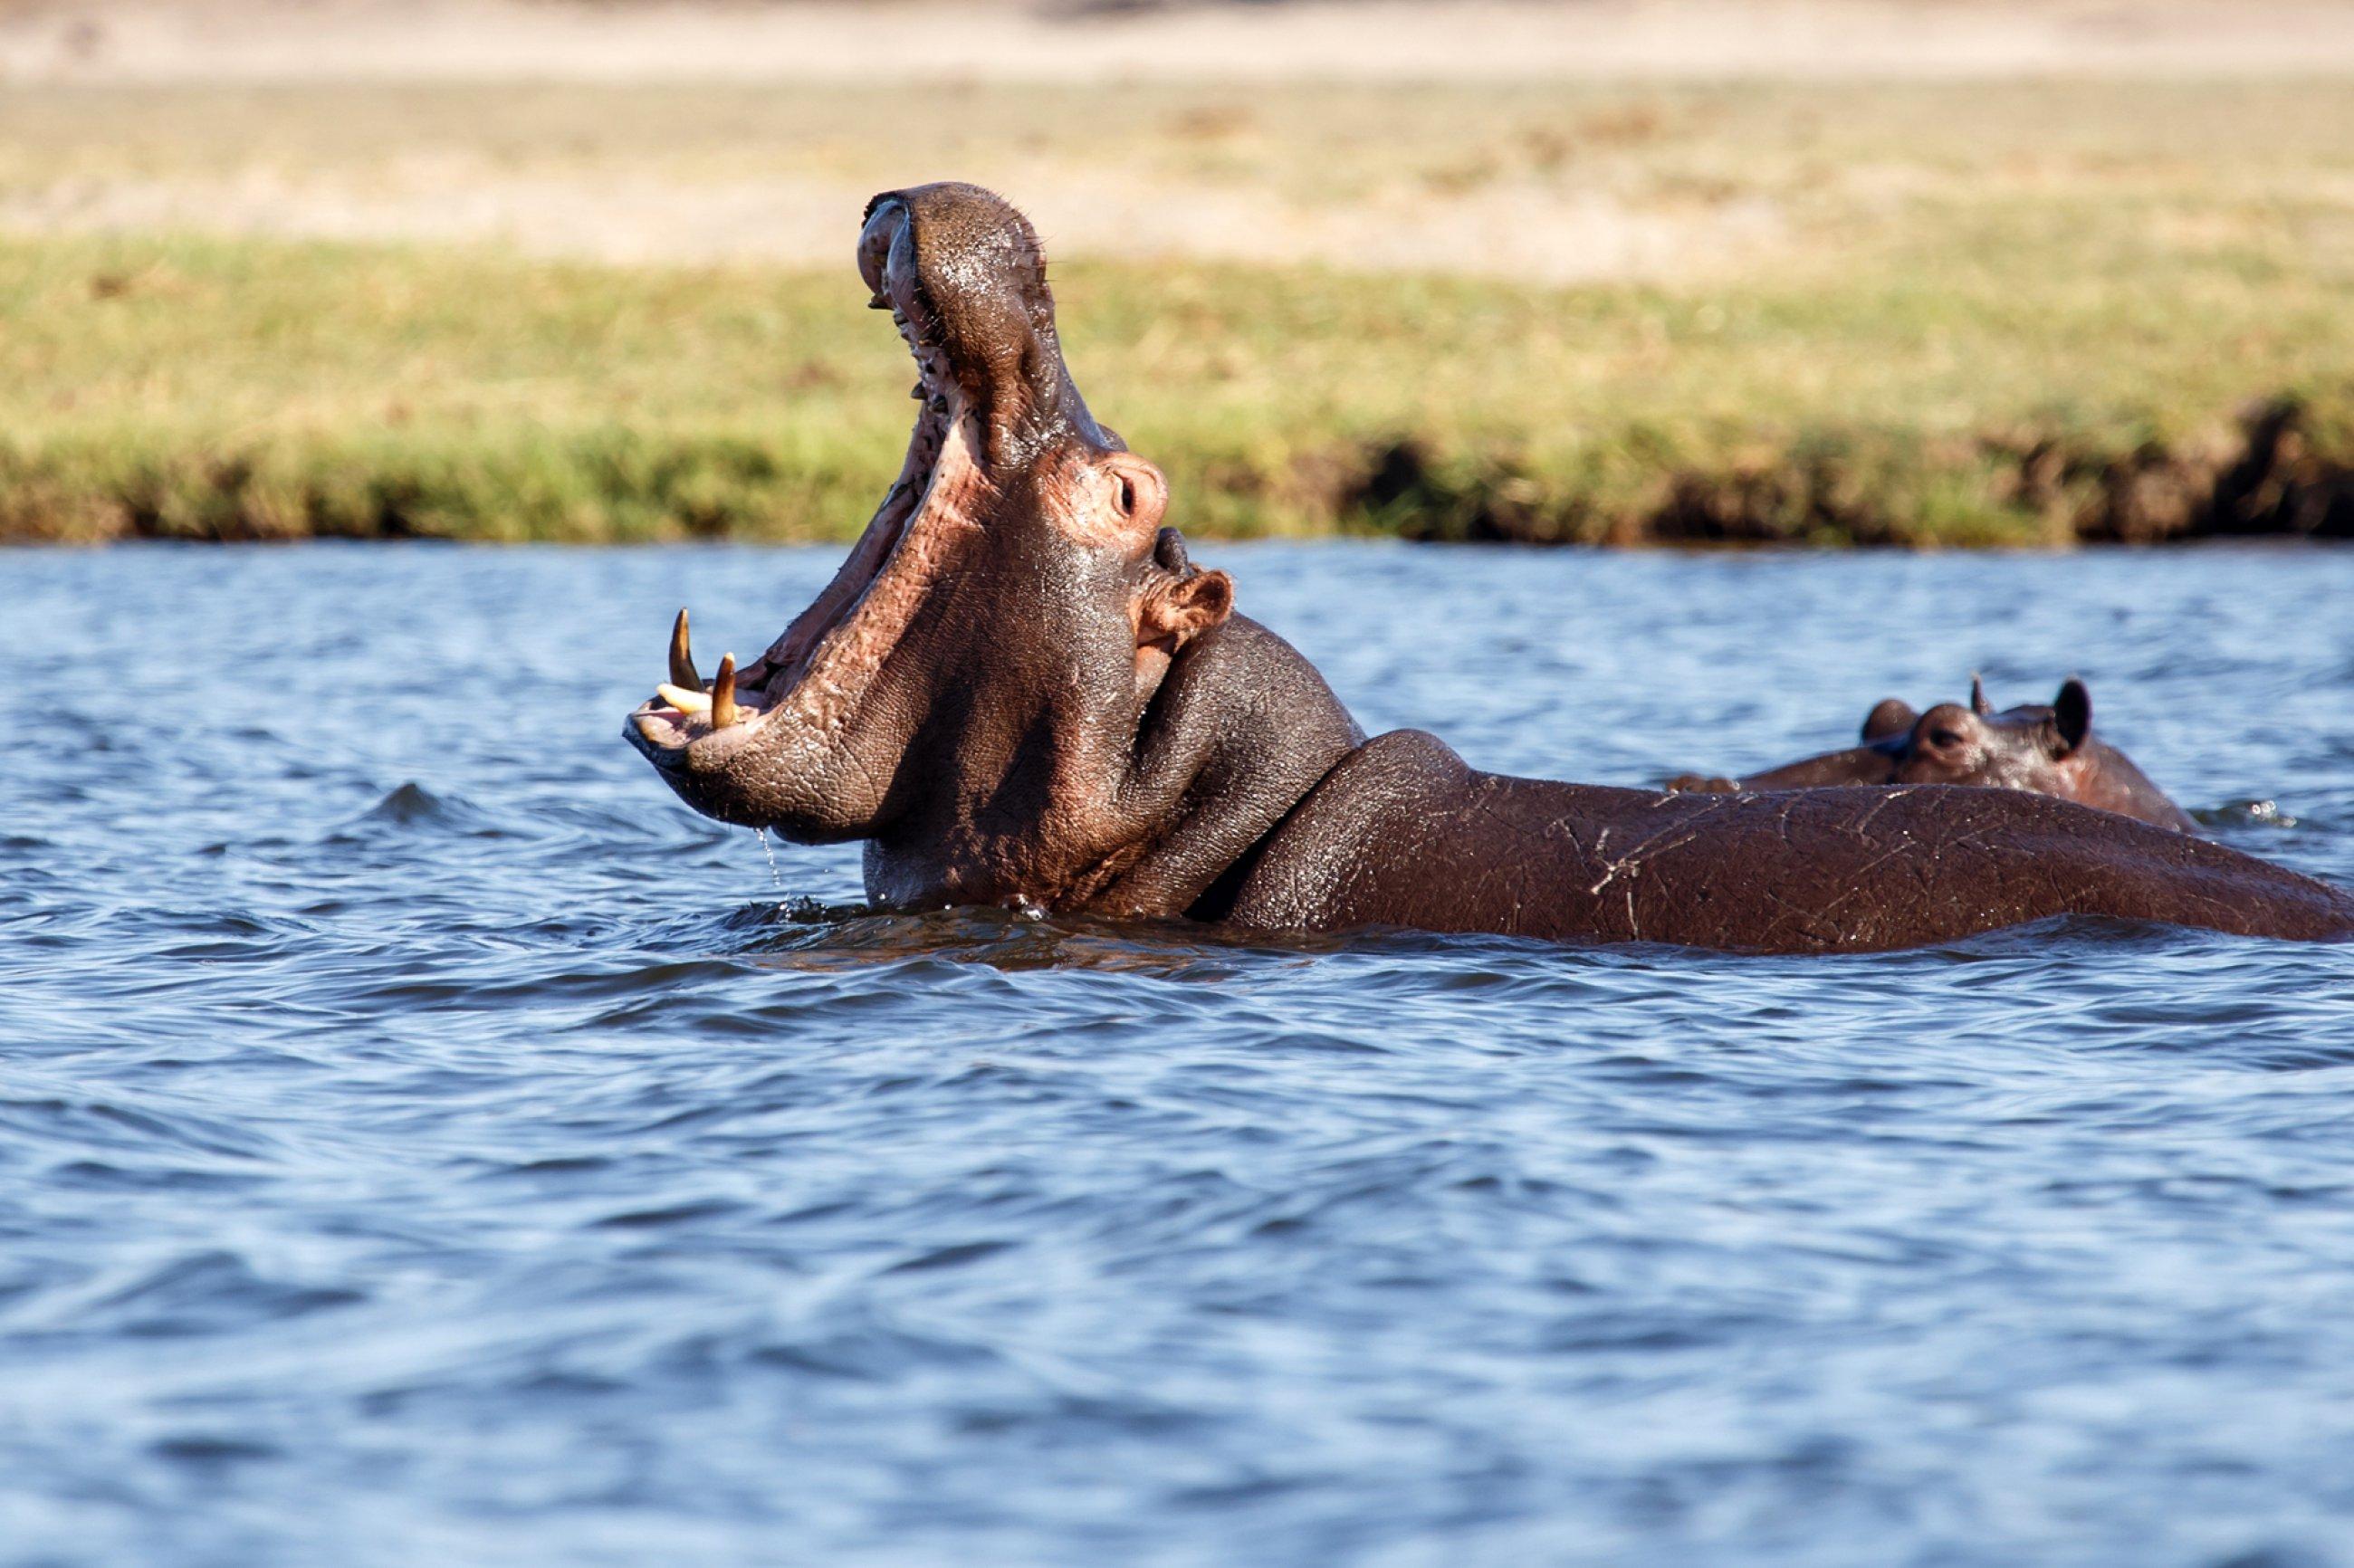 https://bubo.sk/uploads/galleries/7303/120-121-zoci-voci-najnebezpecnejsiemu-zvieratu-afriky..jpg